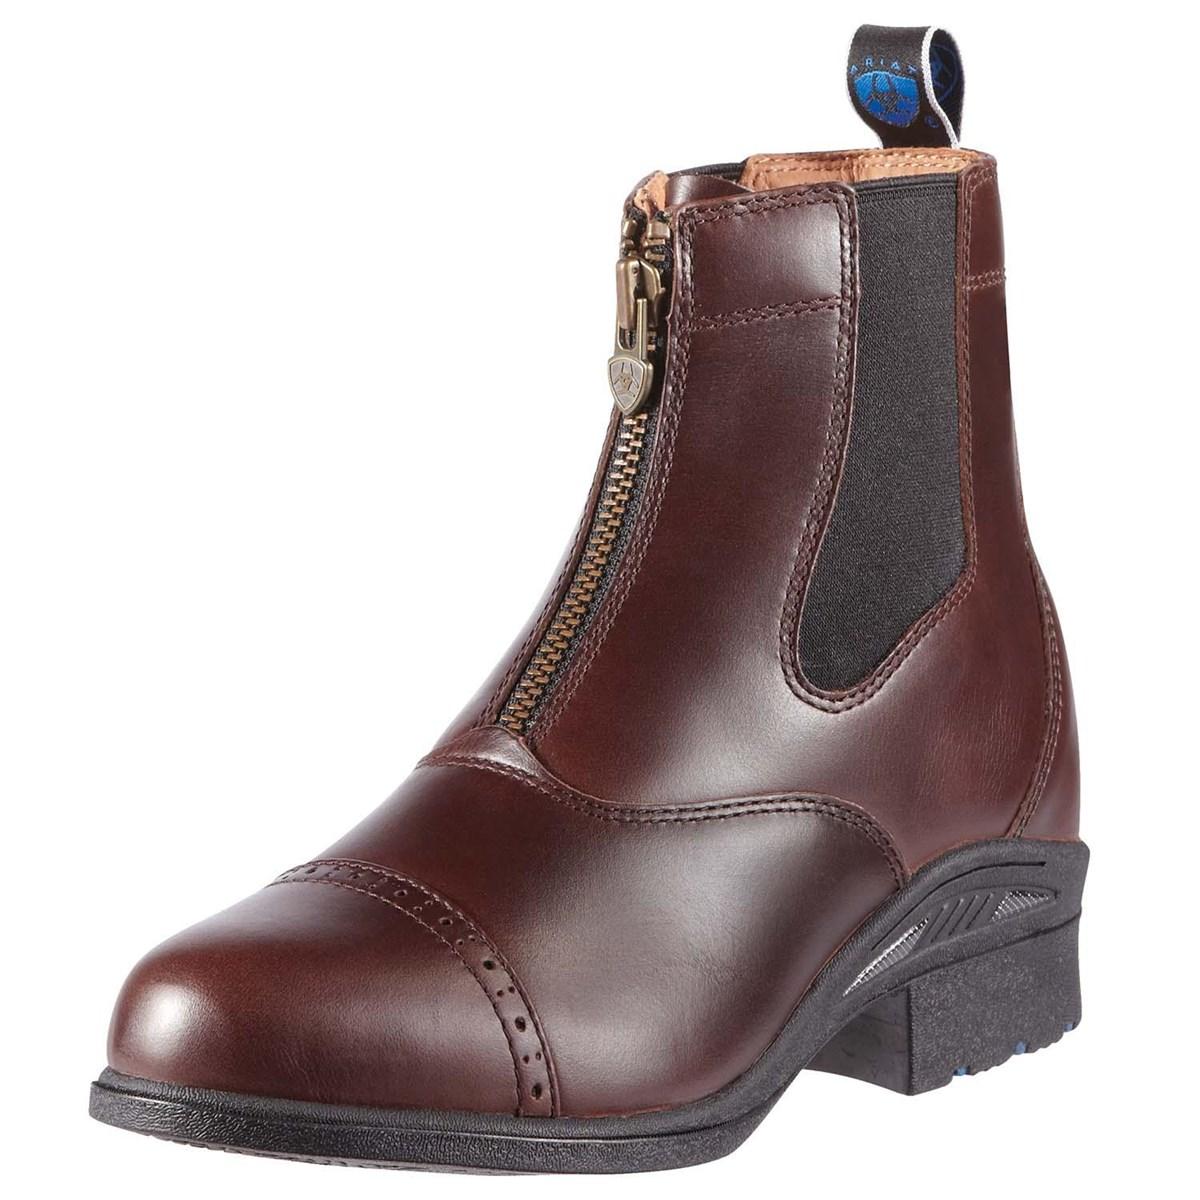 62b0837ebaa Ariat Devon Pro VX Womens Paddock Boot - Waxed Chocolate